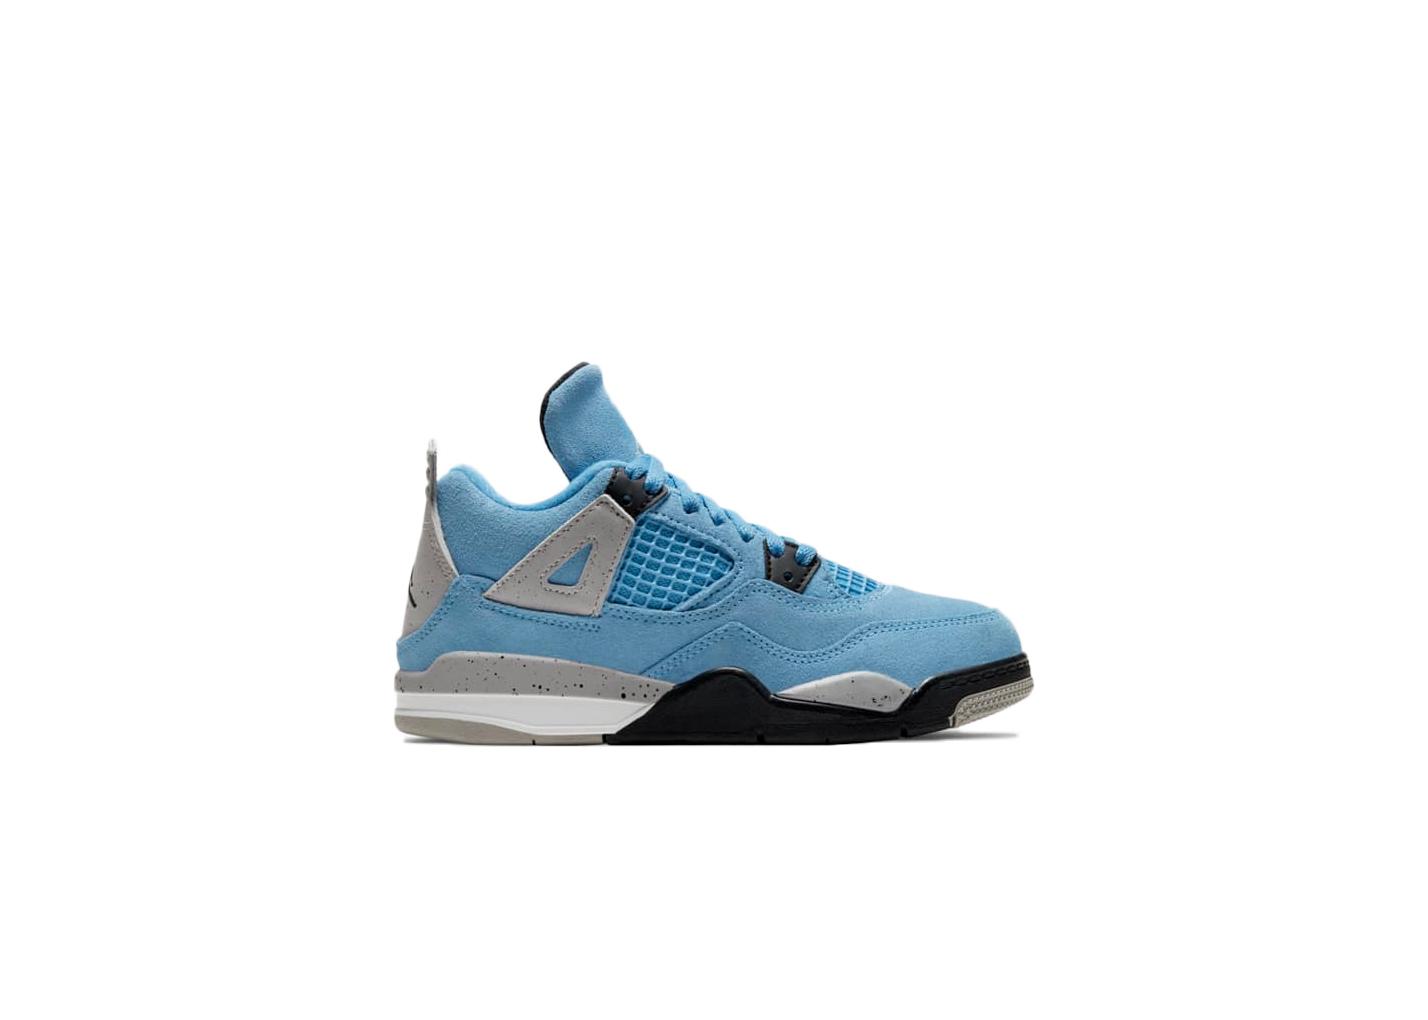 Jordan 4 Retro University Blue (PS)